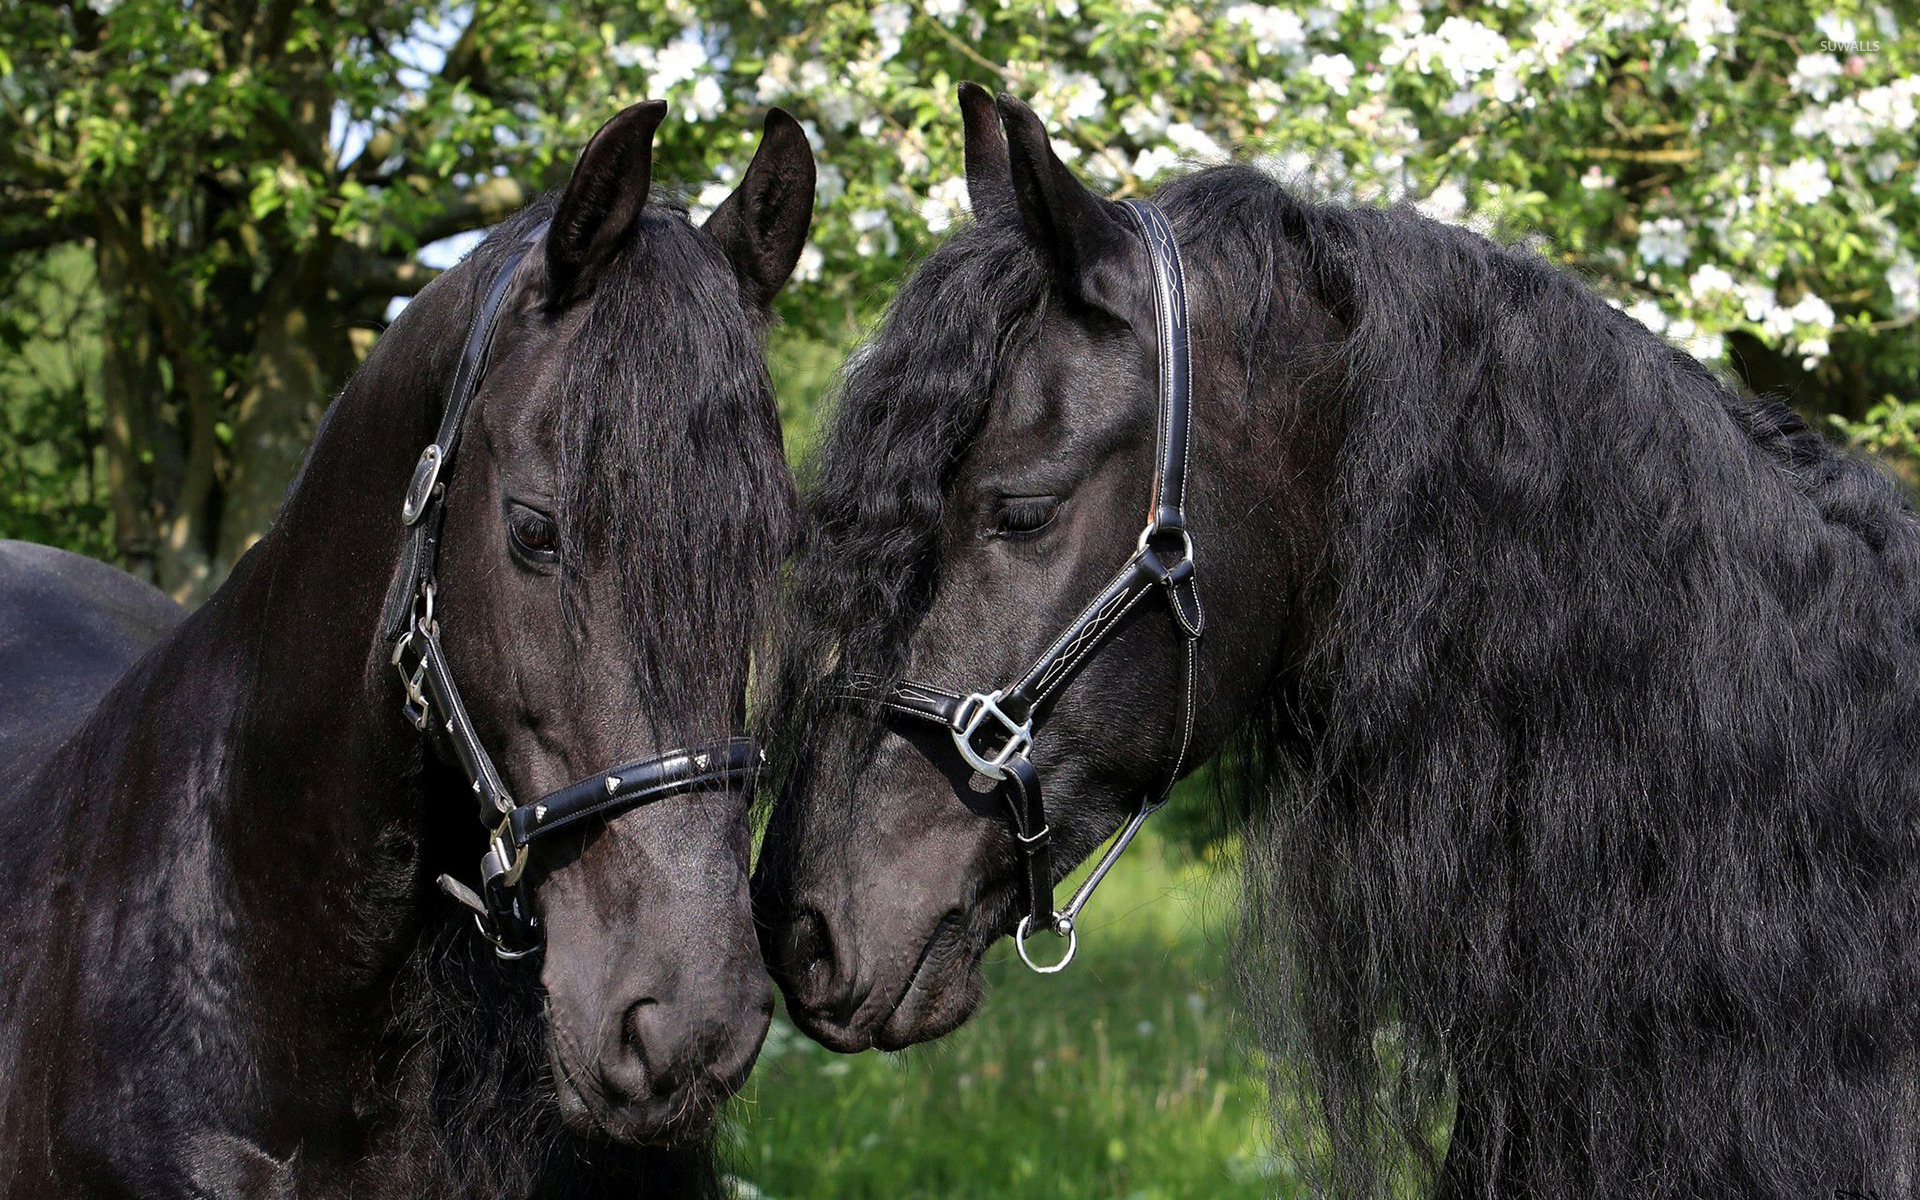 Black Horses Wallpaper Animal Wallpapers 32785